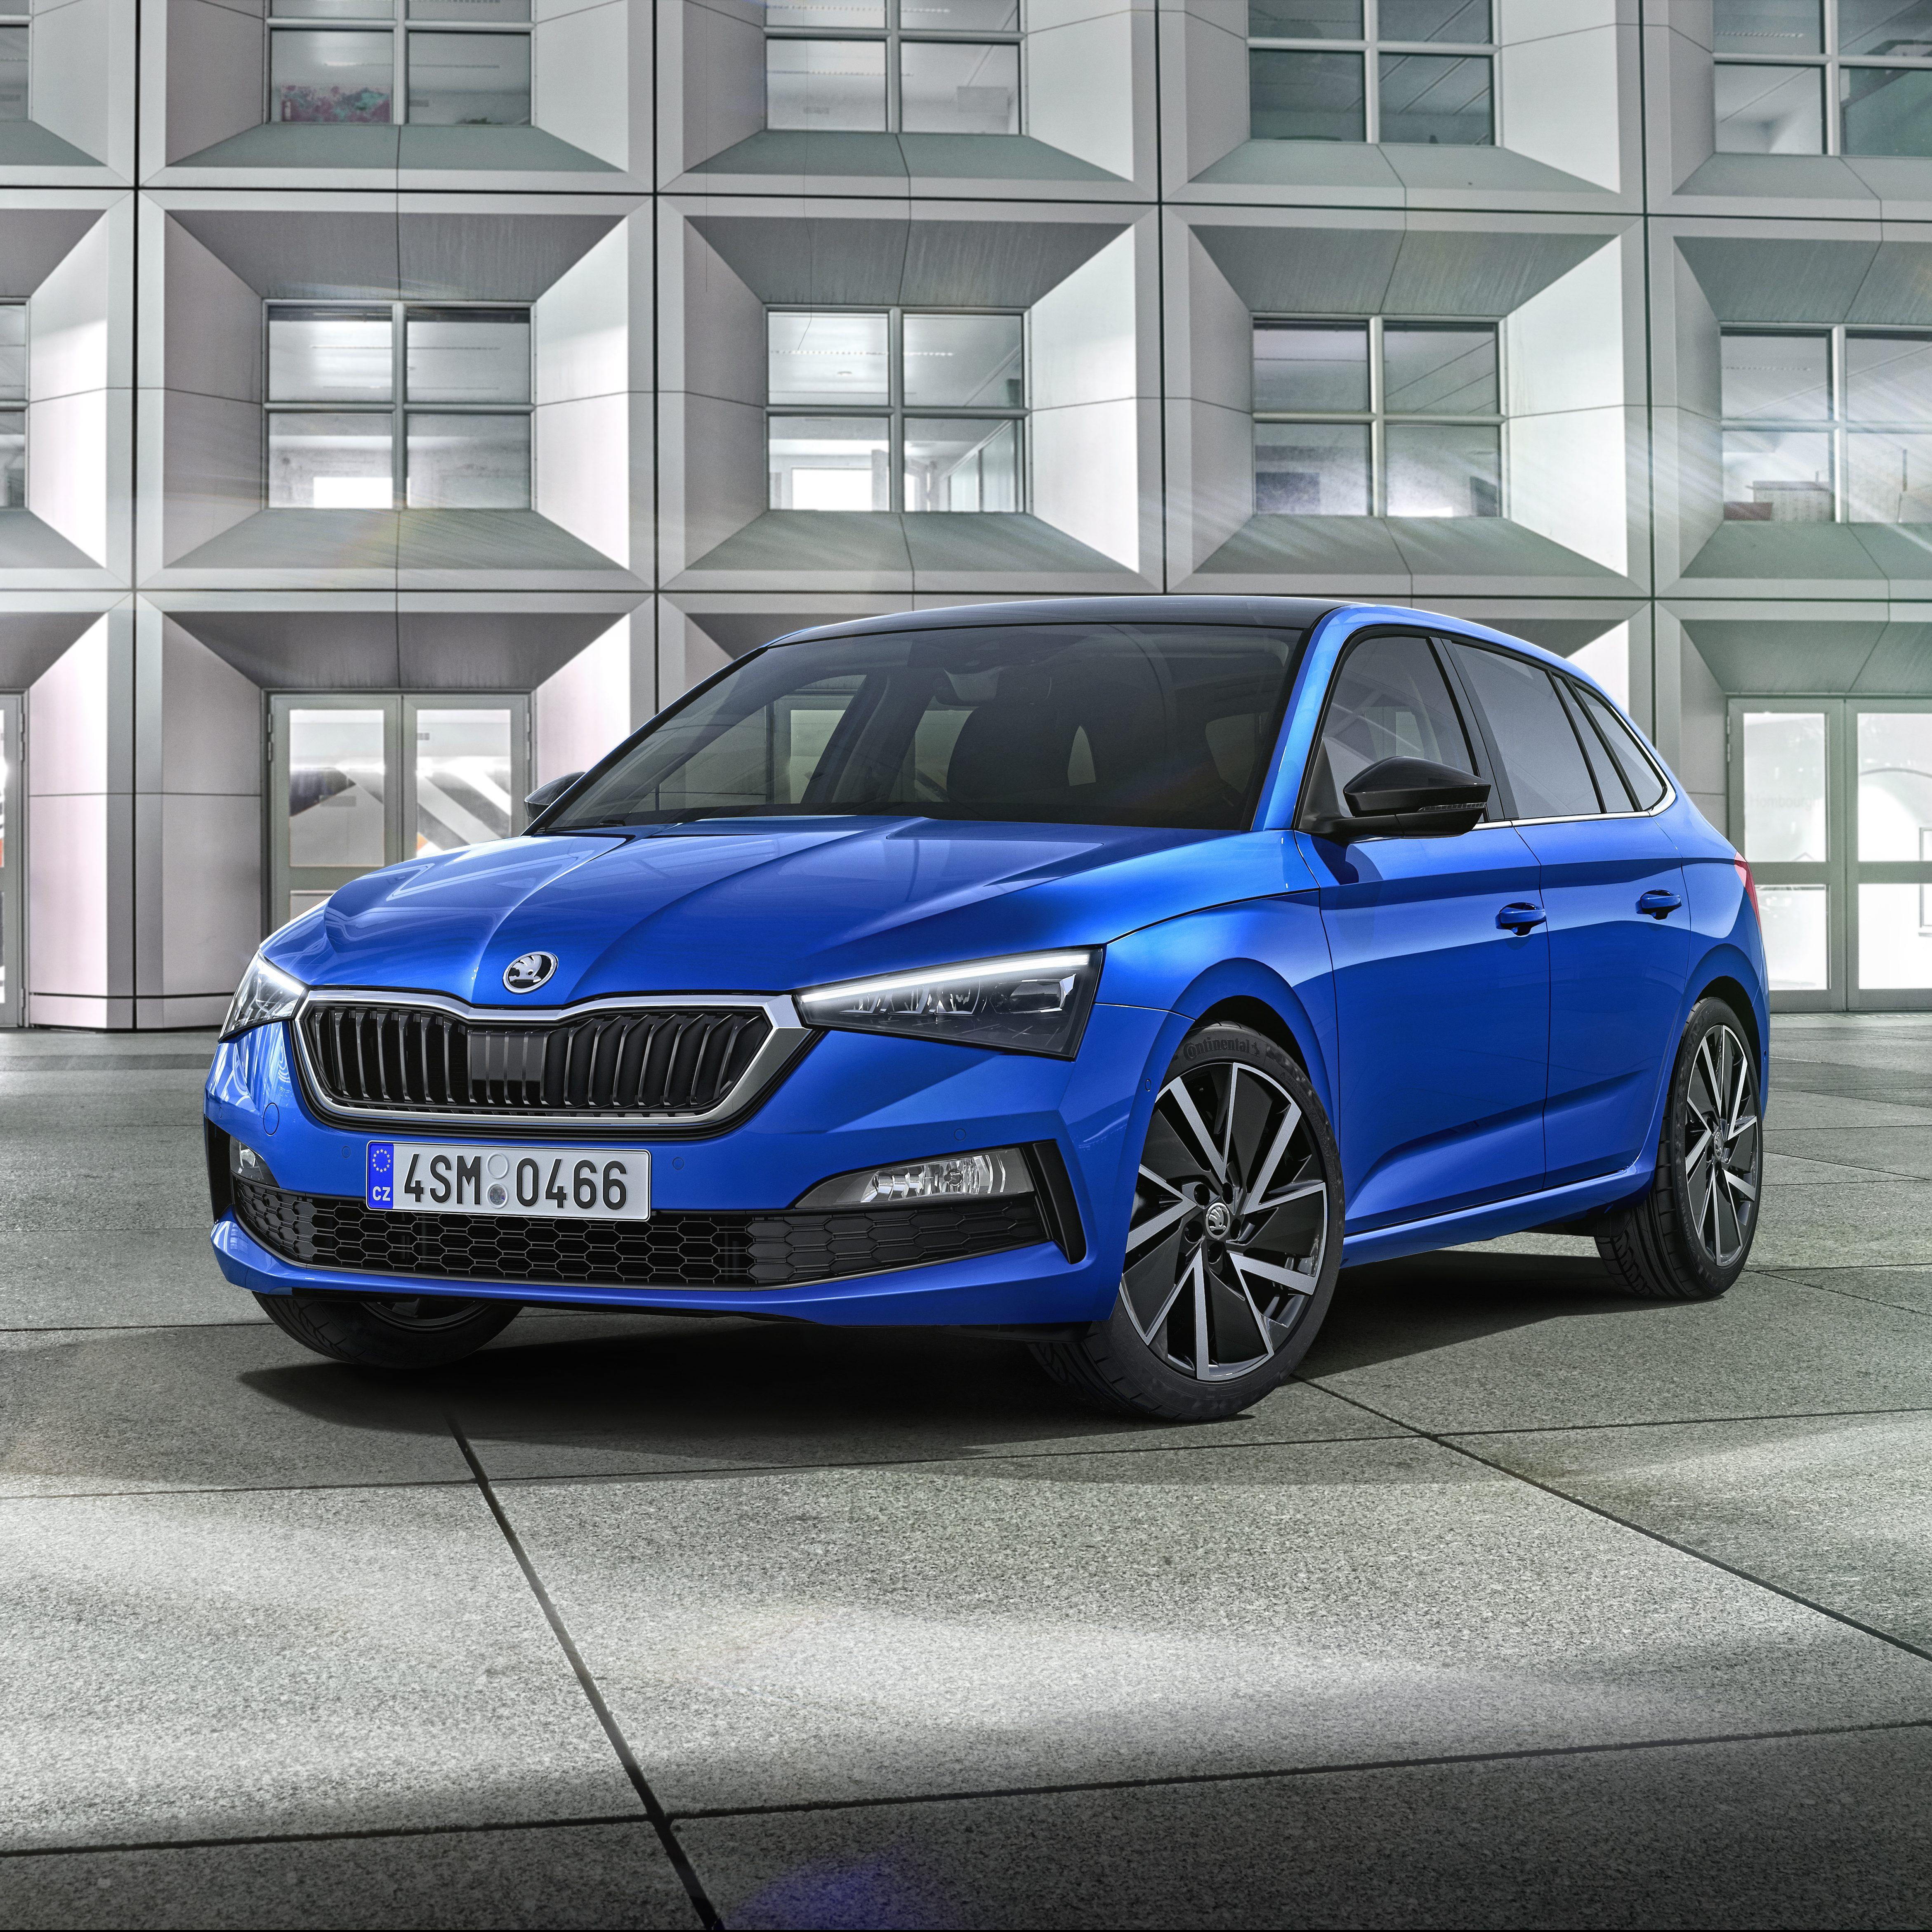 The Škoda Scala New Definition Of Compact Car Segment For Czech Carmaker